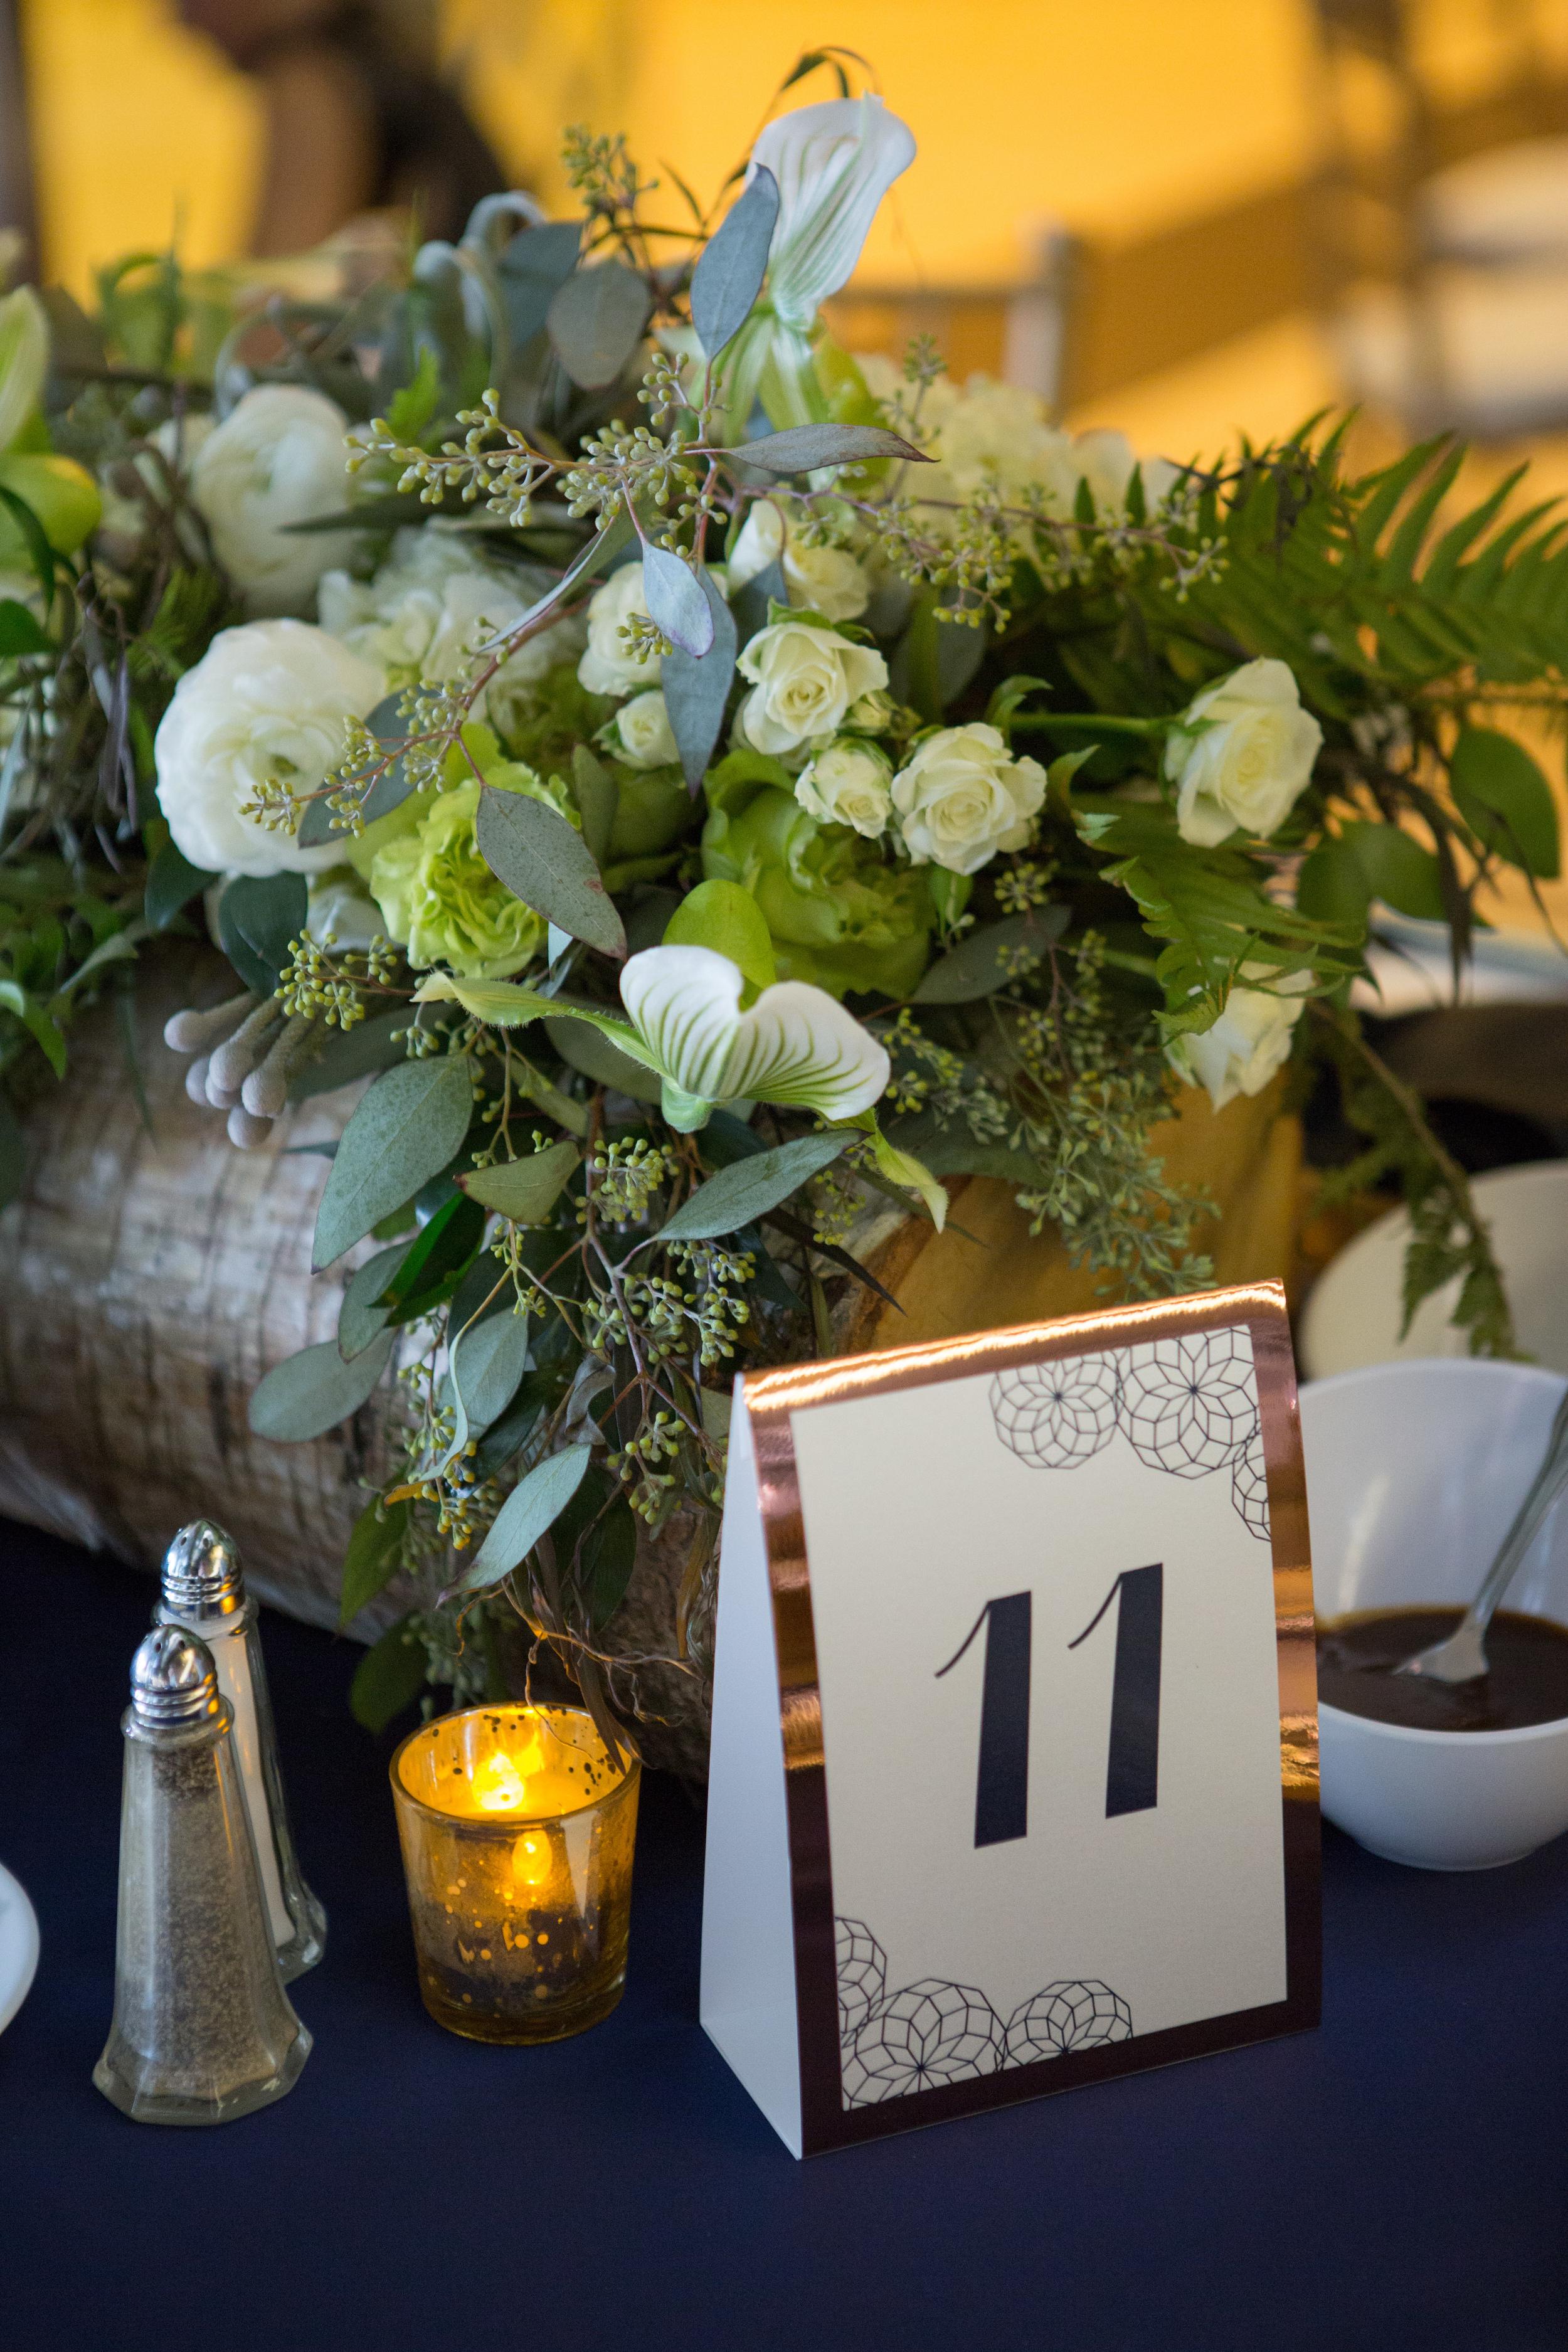 Acowsay_Cinema_MN_Wedding_Table_Number.jpg